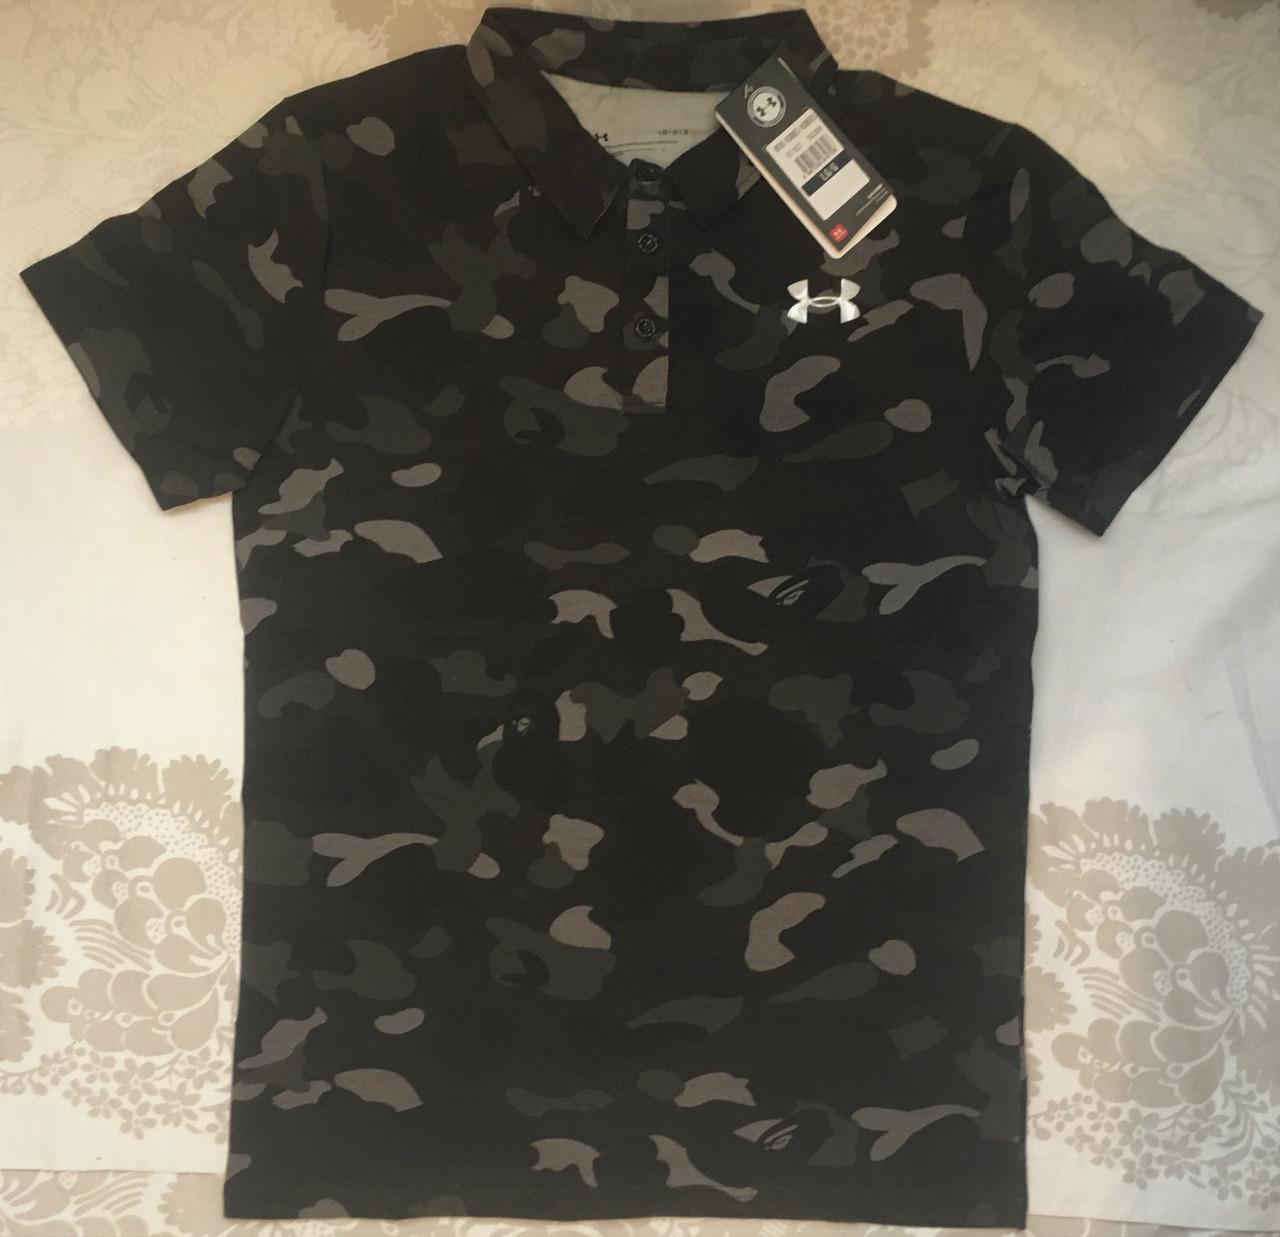 d44714b8390 Мужская футболка поло Under Armour M   продажа